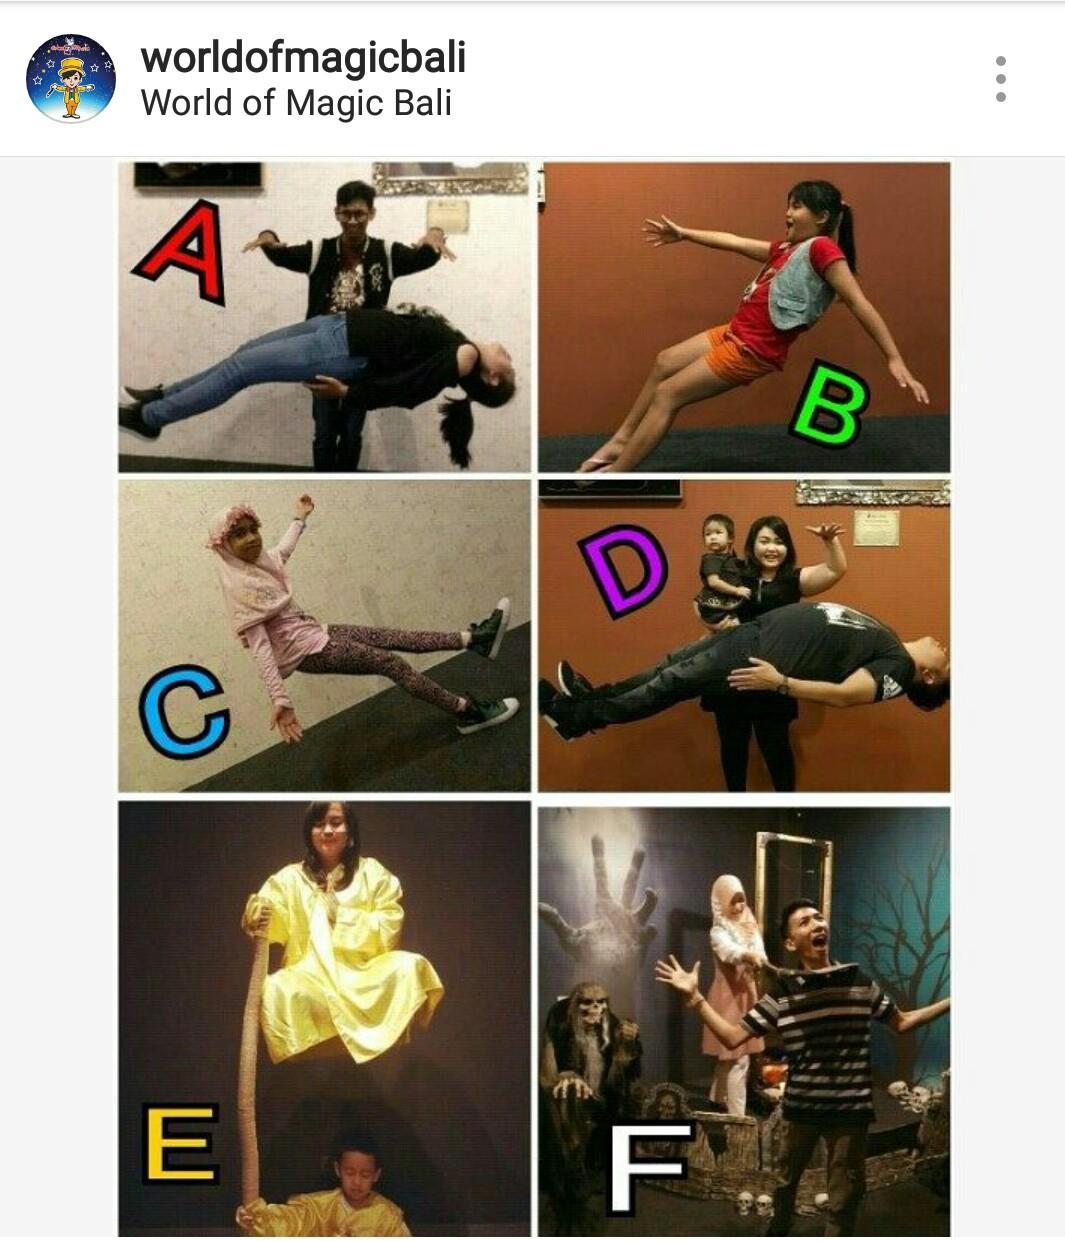 World Magic Kids Holiday Spots Liburan Anak Informasi Liburananak Worldofmagic